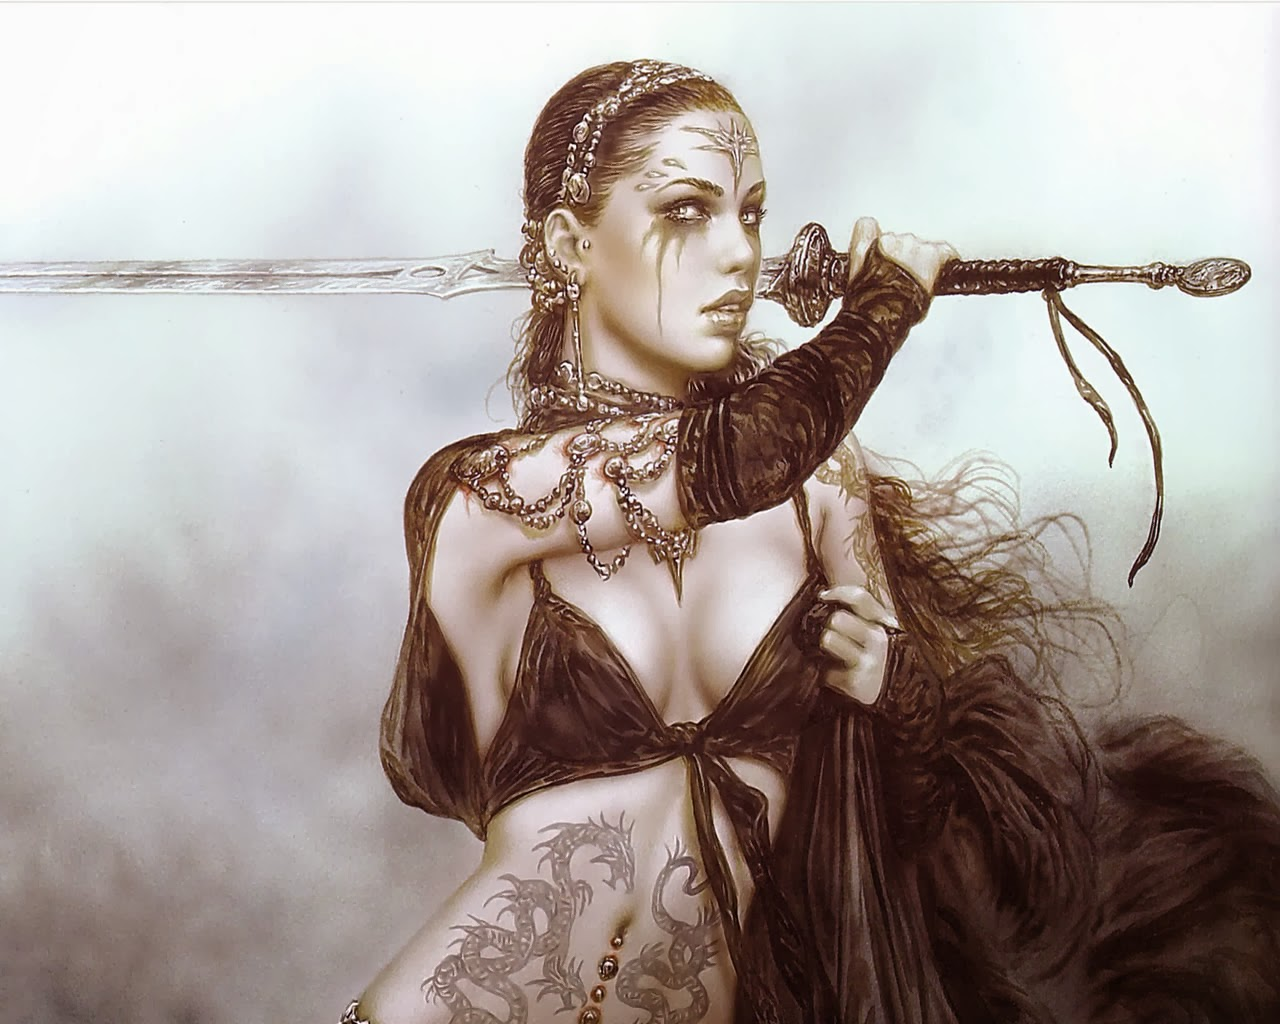 http://2.bp.blogspot.com/-y8DbjMBgfLc/UugJMPEKHwI/AAAAAAAANpg/Ug8d2VY_2gs/s1600/guerriera-fantasy-2.jpg